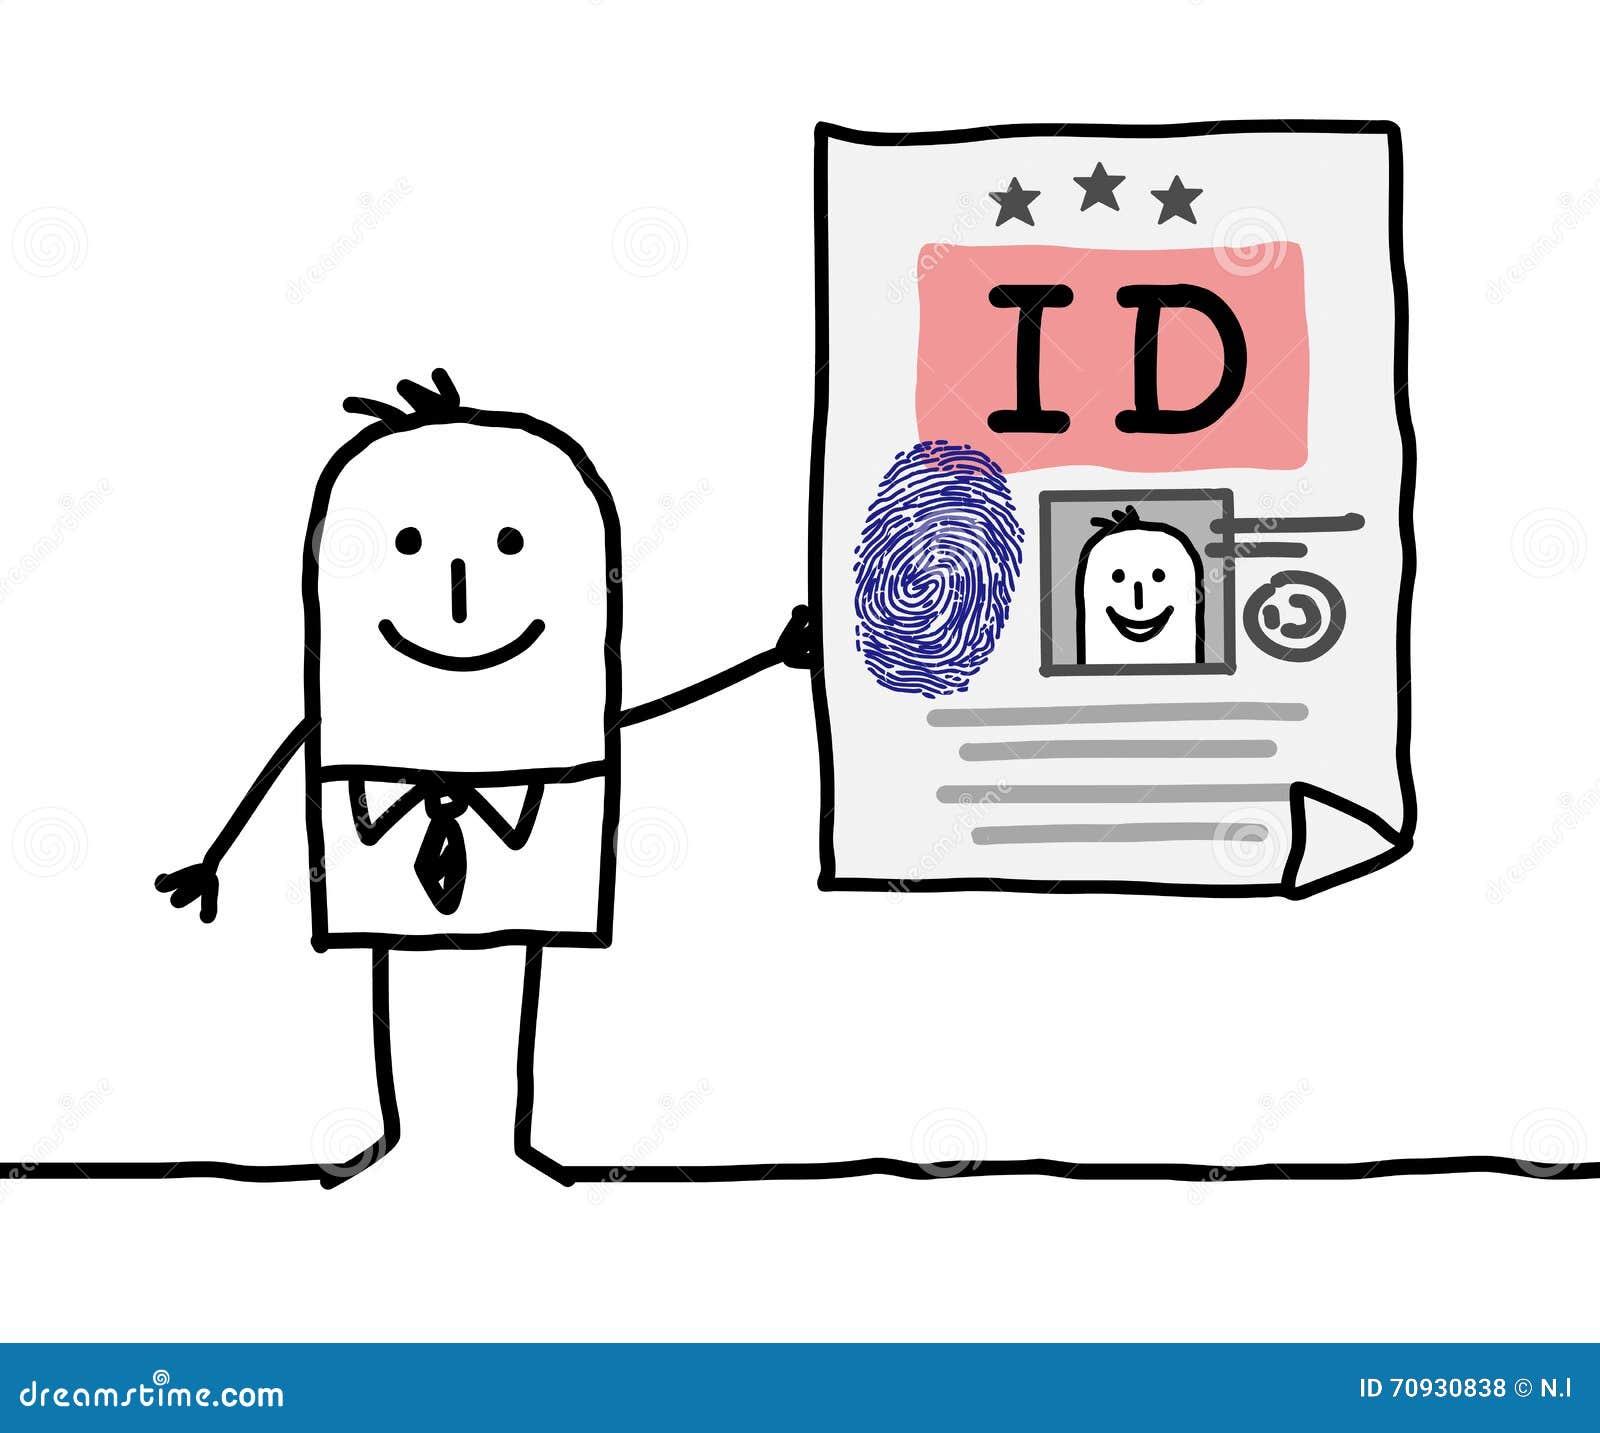 E Card Cartoon Characters : Cartoon character identity card stock vector